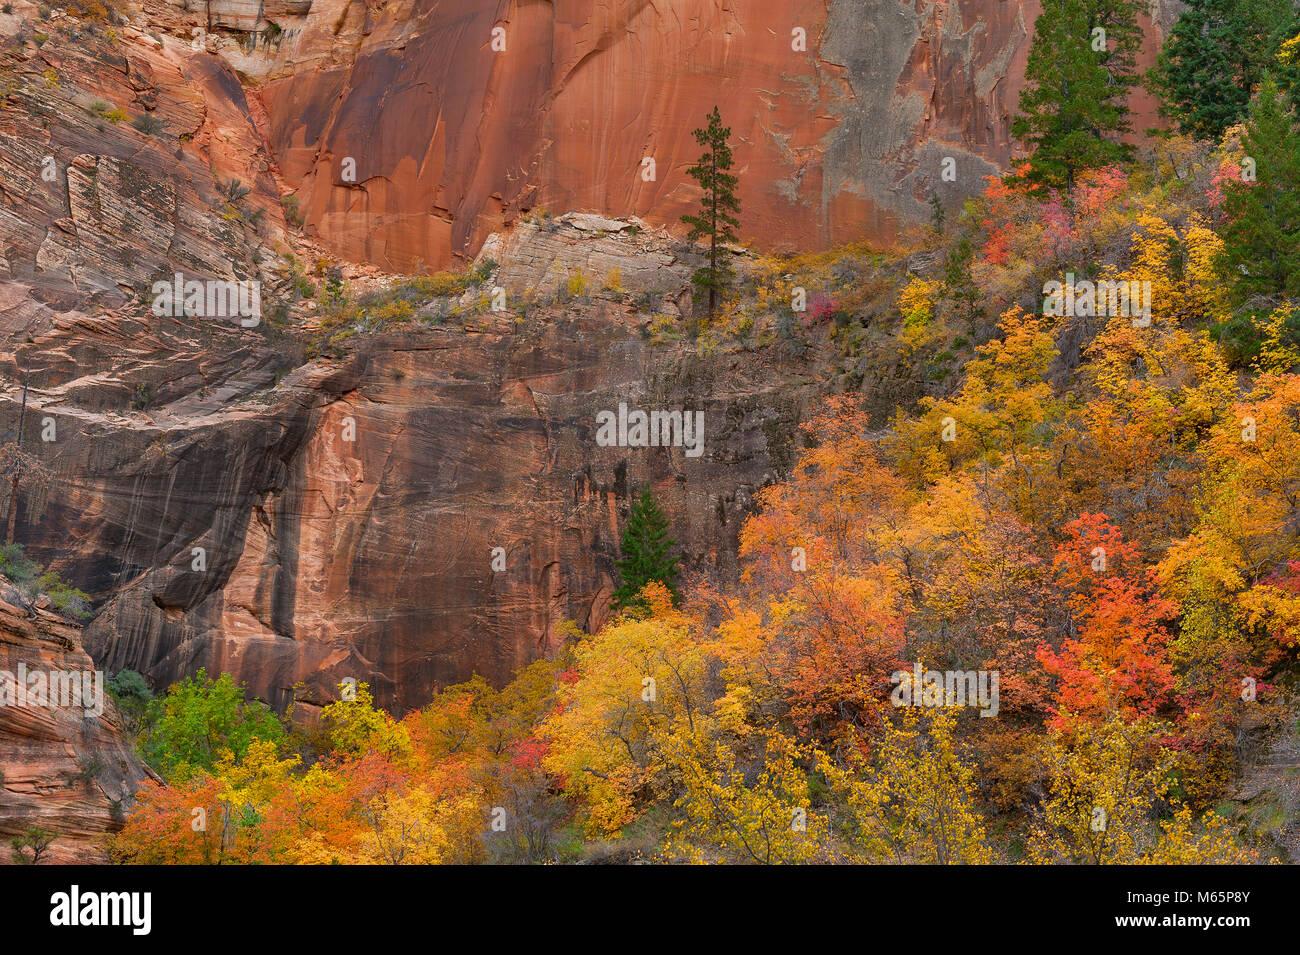 Bigtooth Maple, Acer grandidentatum, Echo Canyon, Zion National Park, Utah Stock Photo